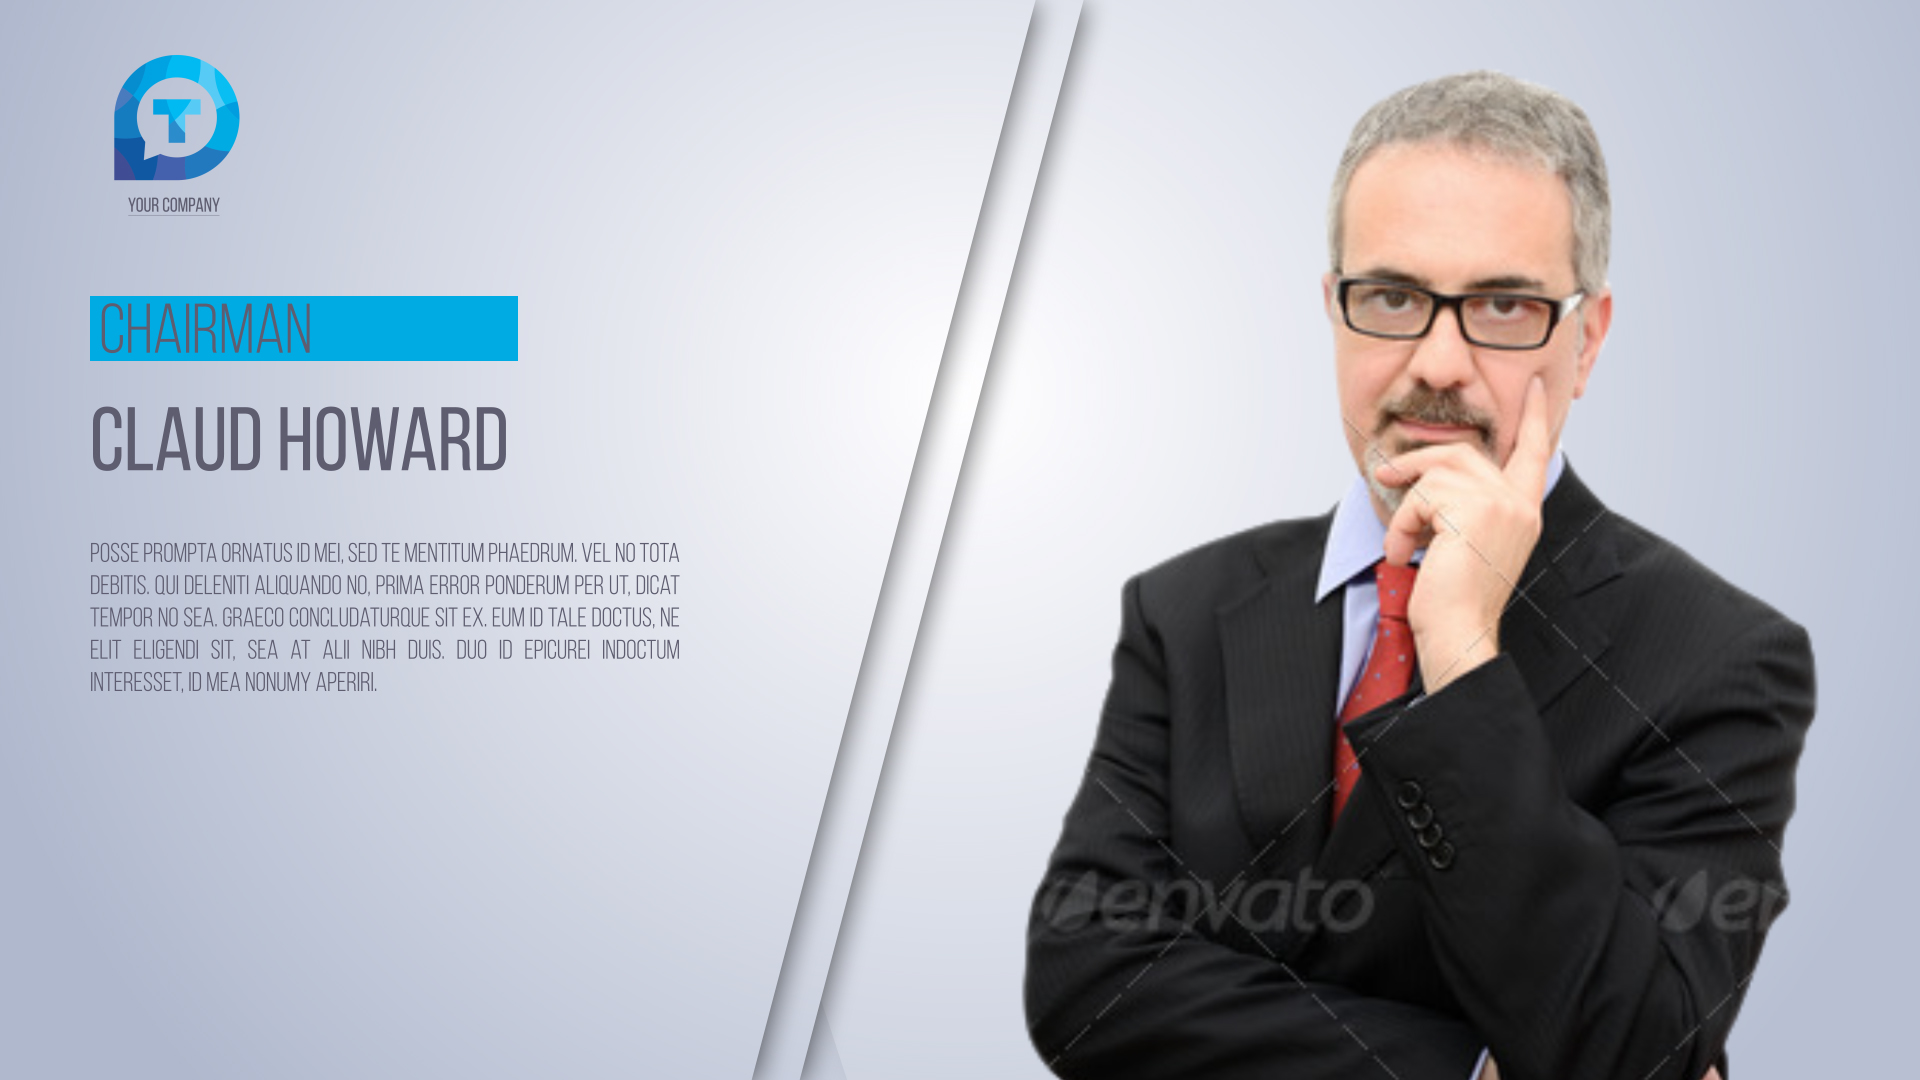 Corporate Presentation - 7